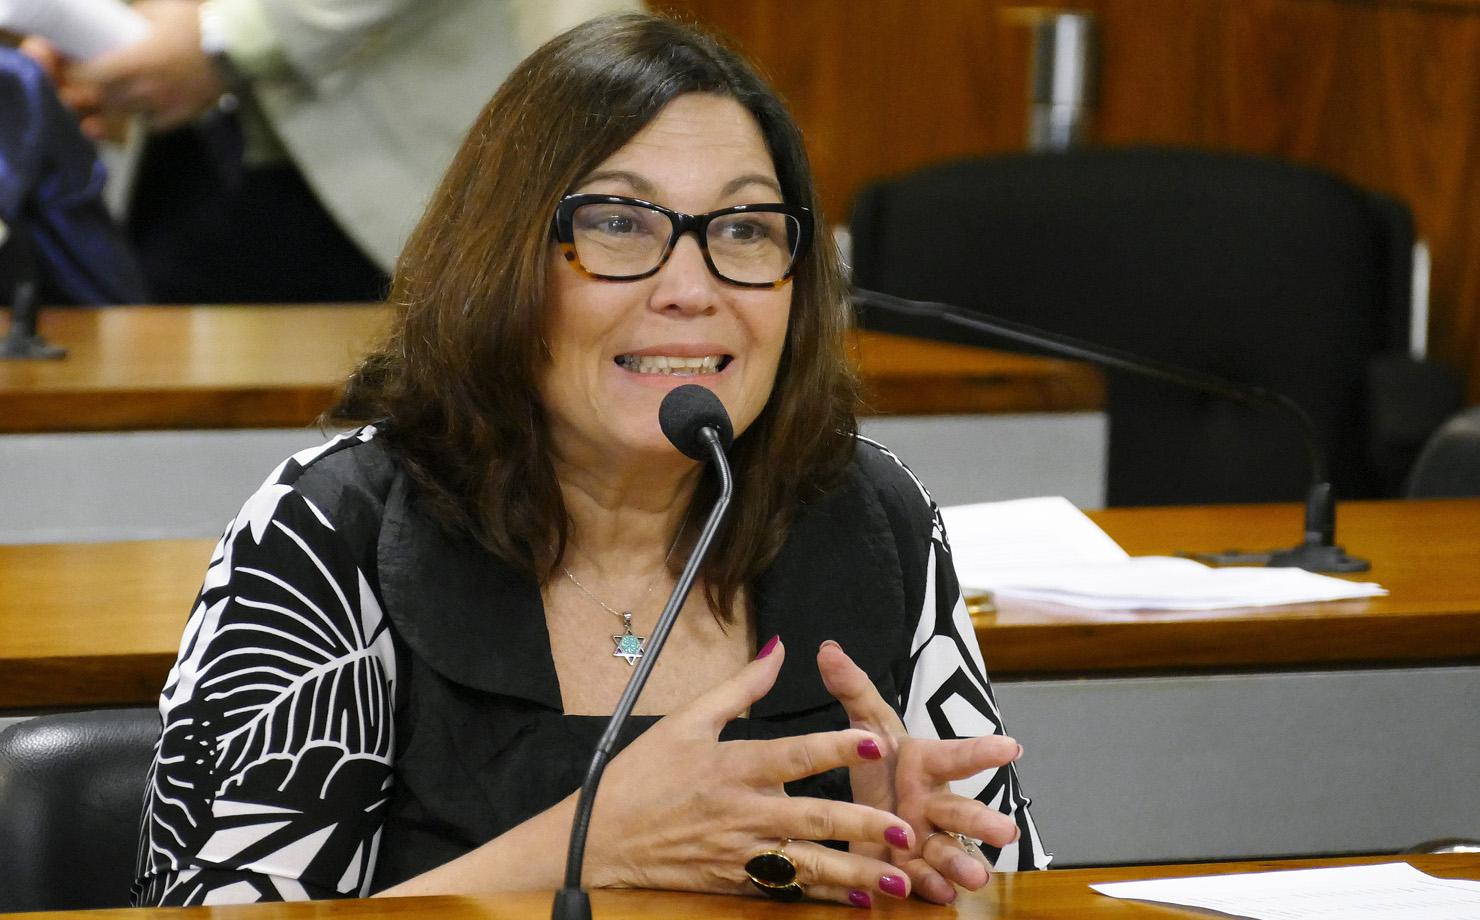 Foto: Edilson RodriguesAgência Senado